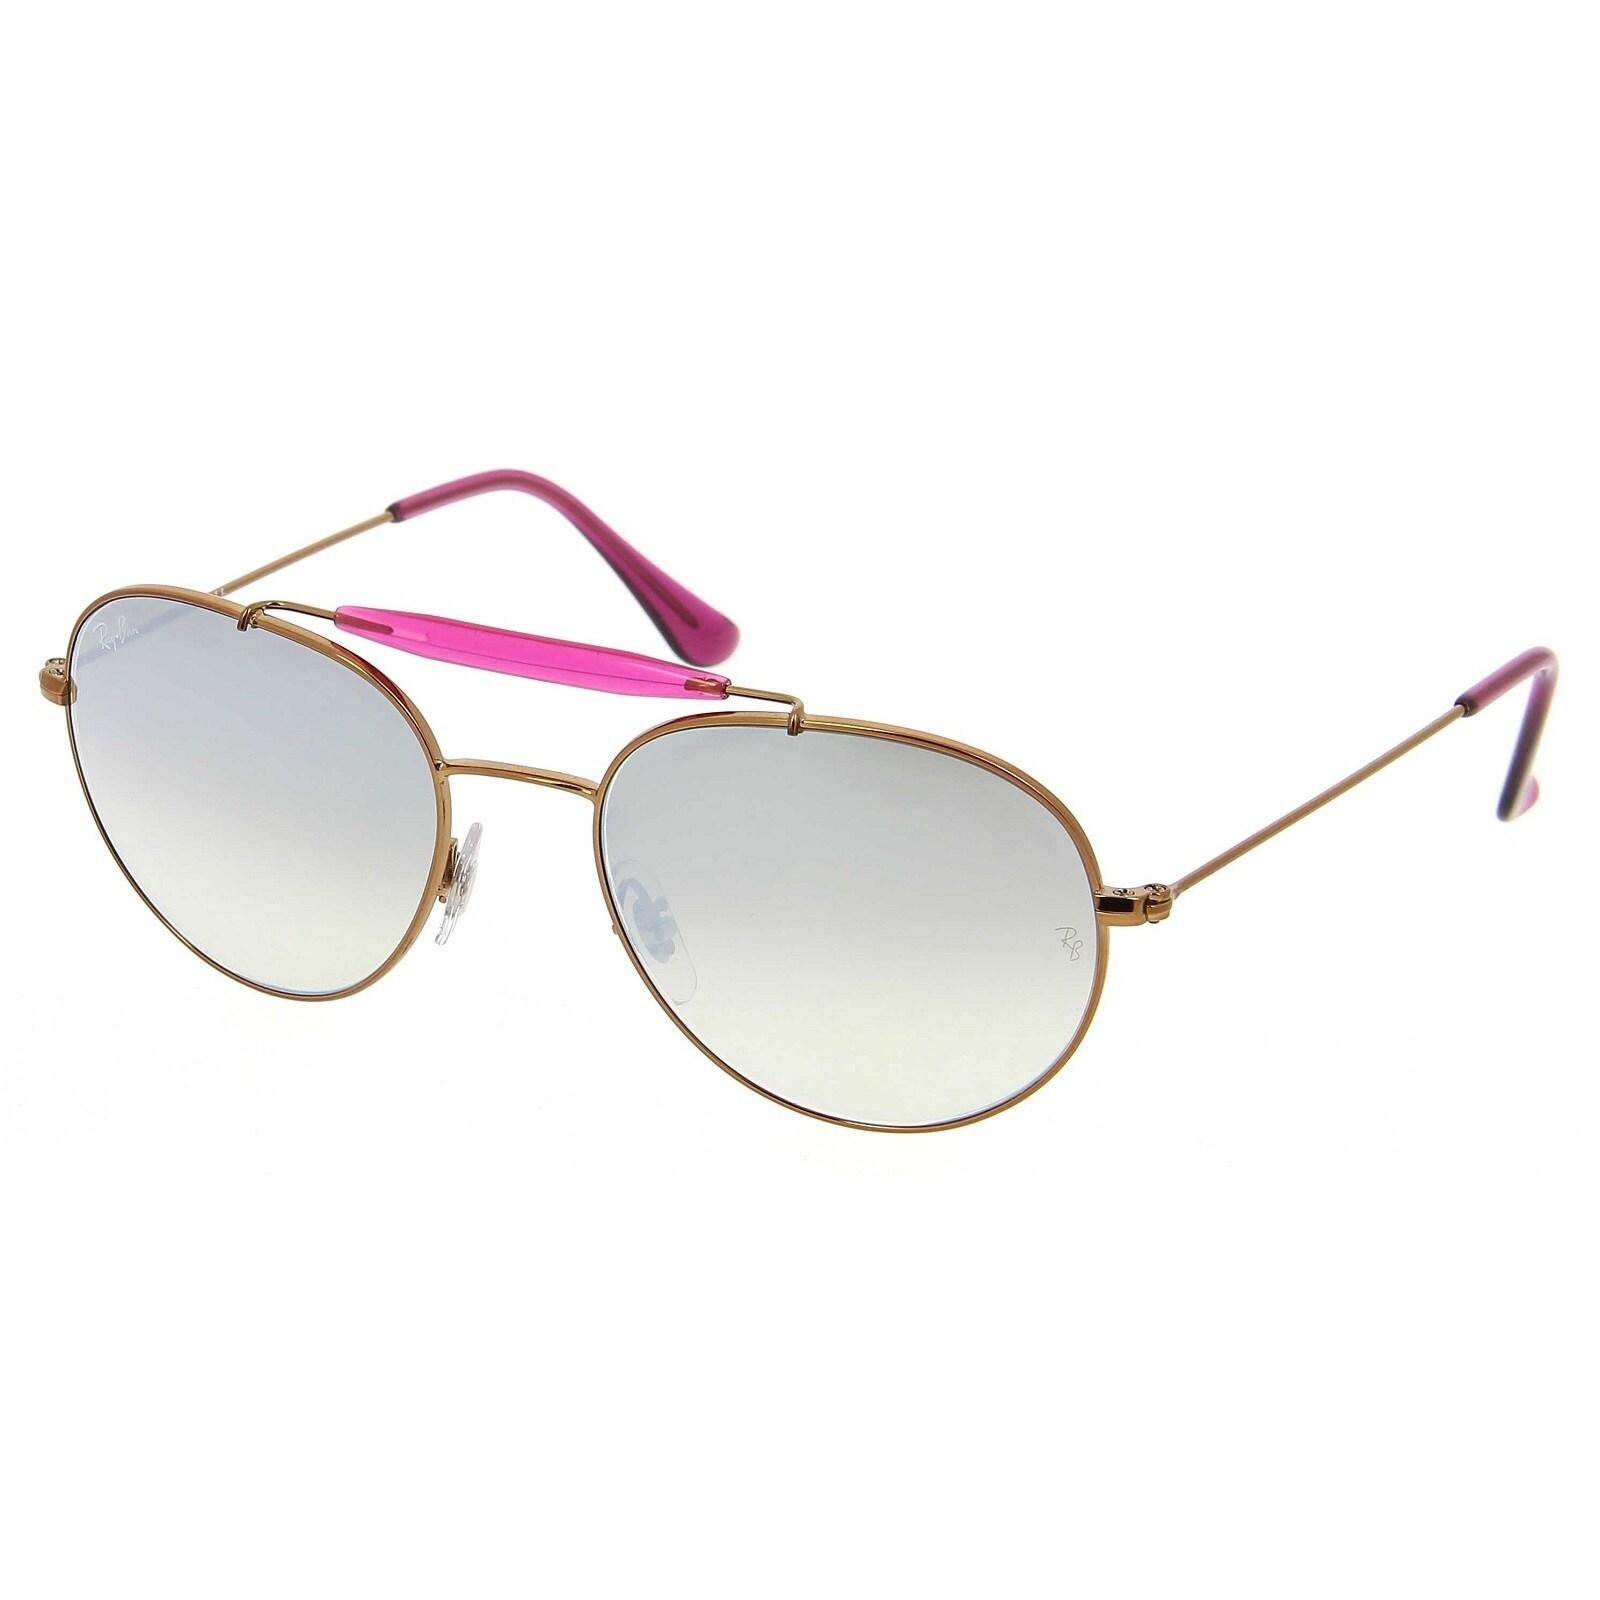 f1bdf052f6 Ray-Ban RB3540 198 9U Bronze Copper Frame Silver Gradient Flash 56mm Lens  Sunglasses